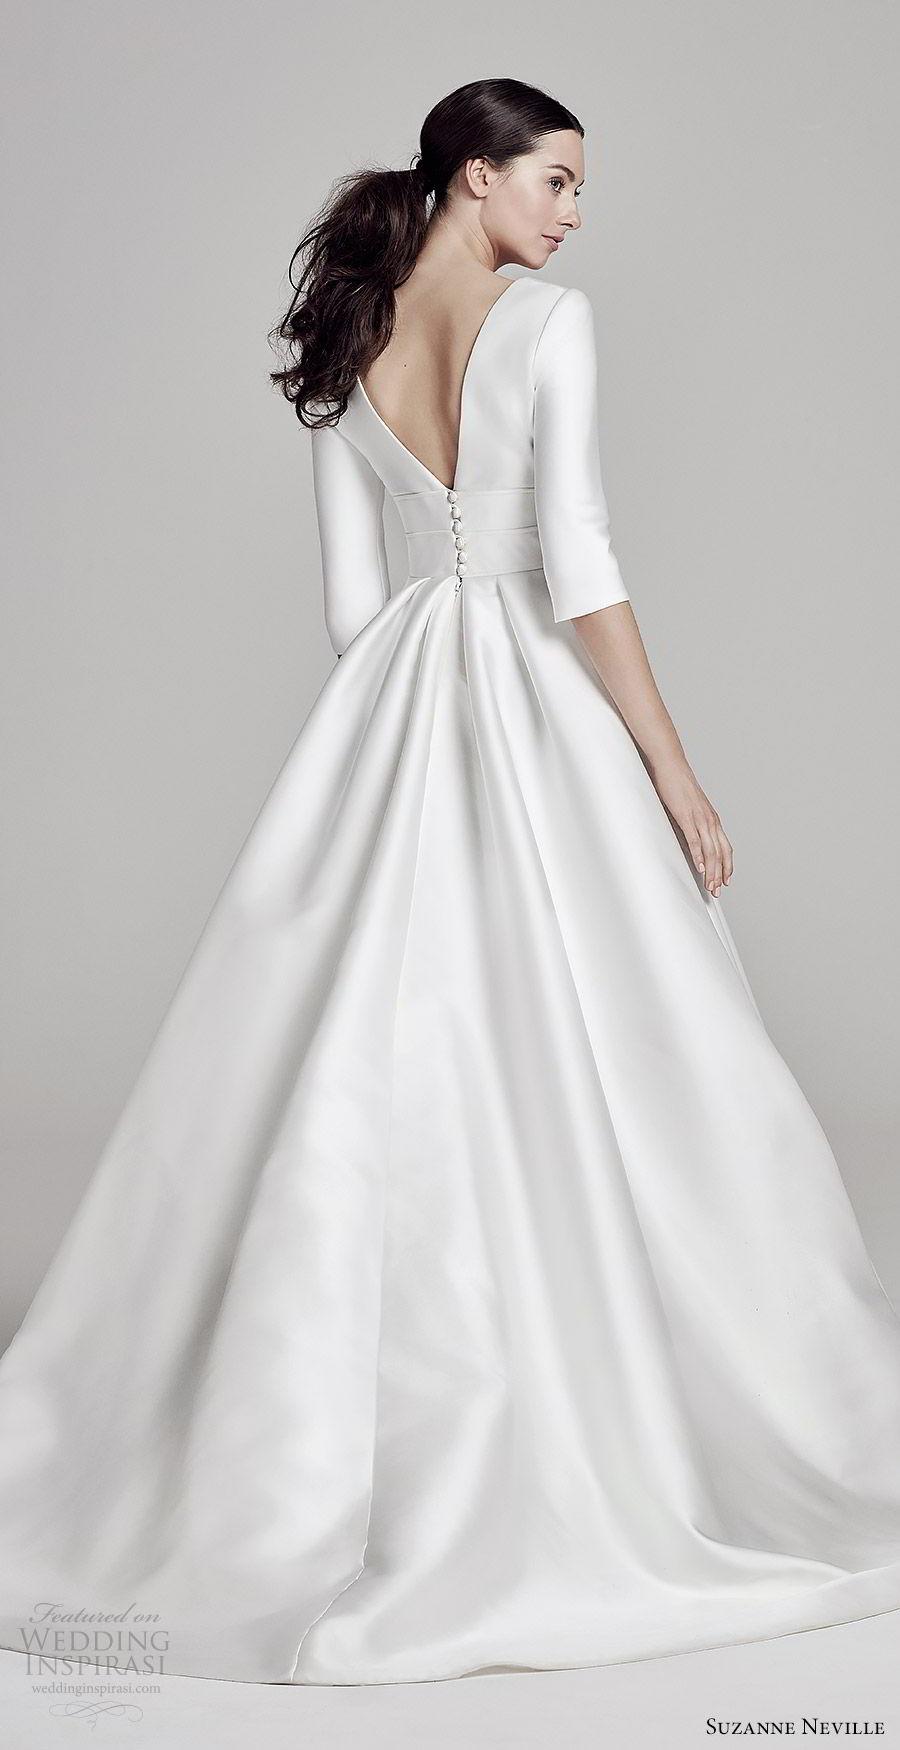 suzanne neville bridal 2019 3 quarter jewel neck minimal a line ball gown wedding dress (layla) v back chapel train clean romantic mv